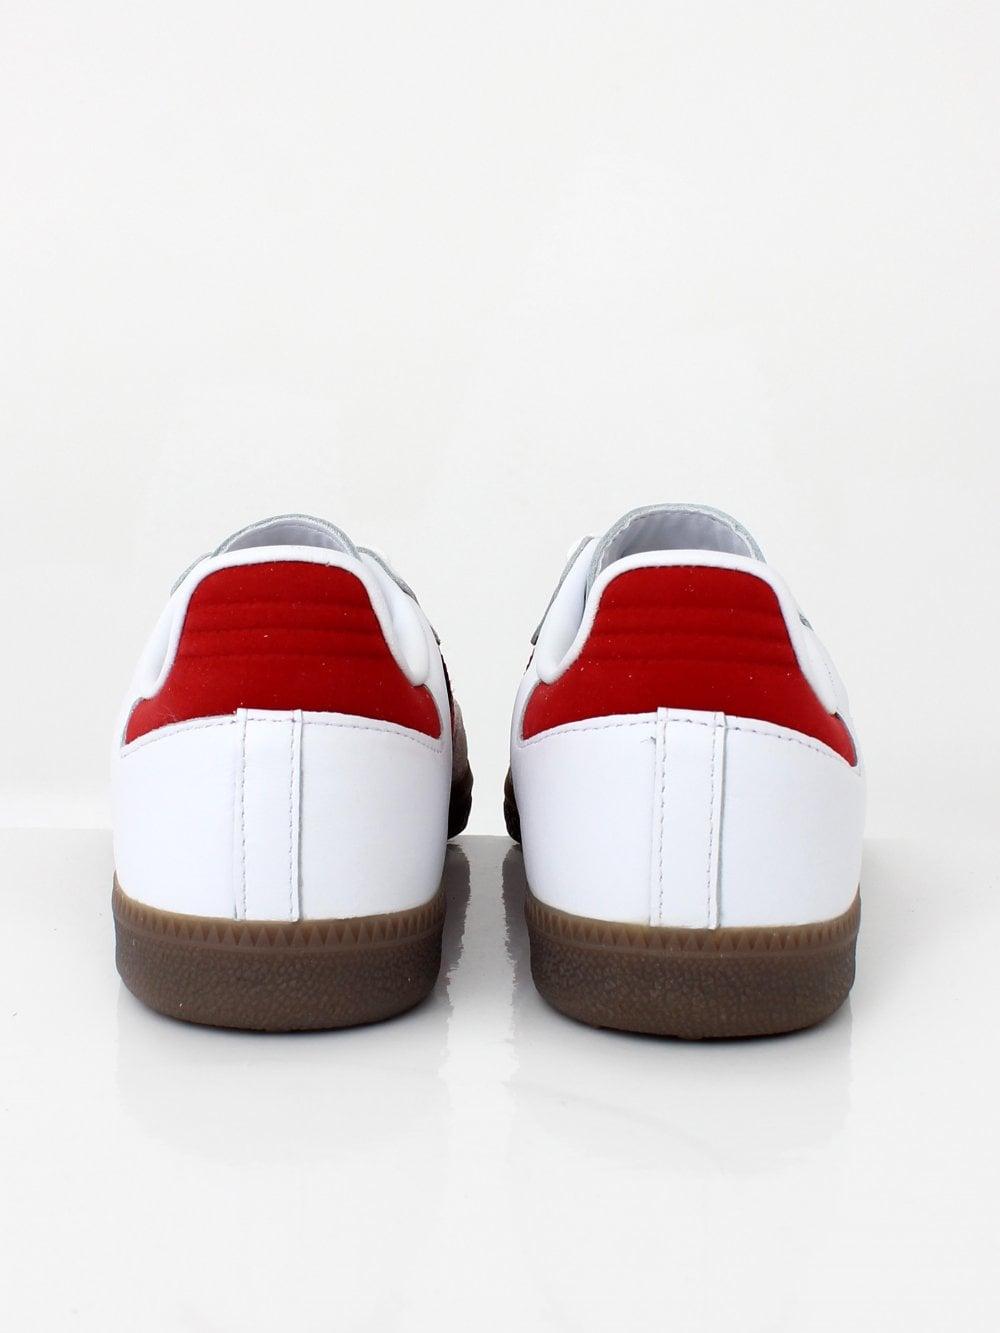 adidas Originals Samba OG Trainers in